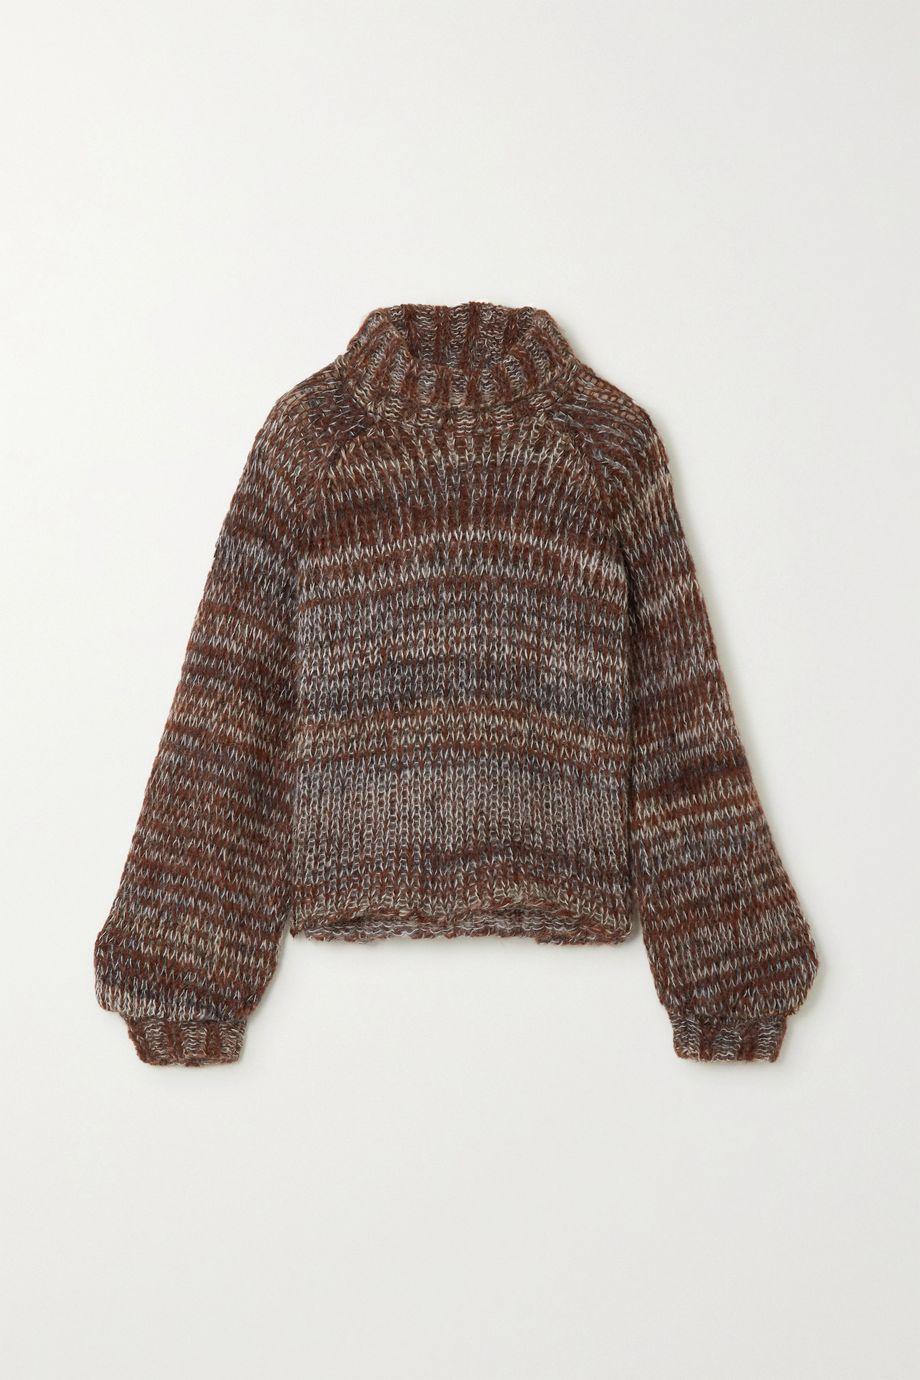 The Range Fog knitted turtleneck sweater